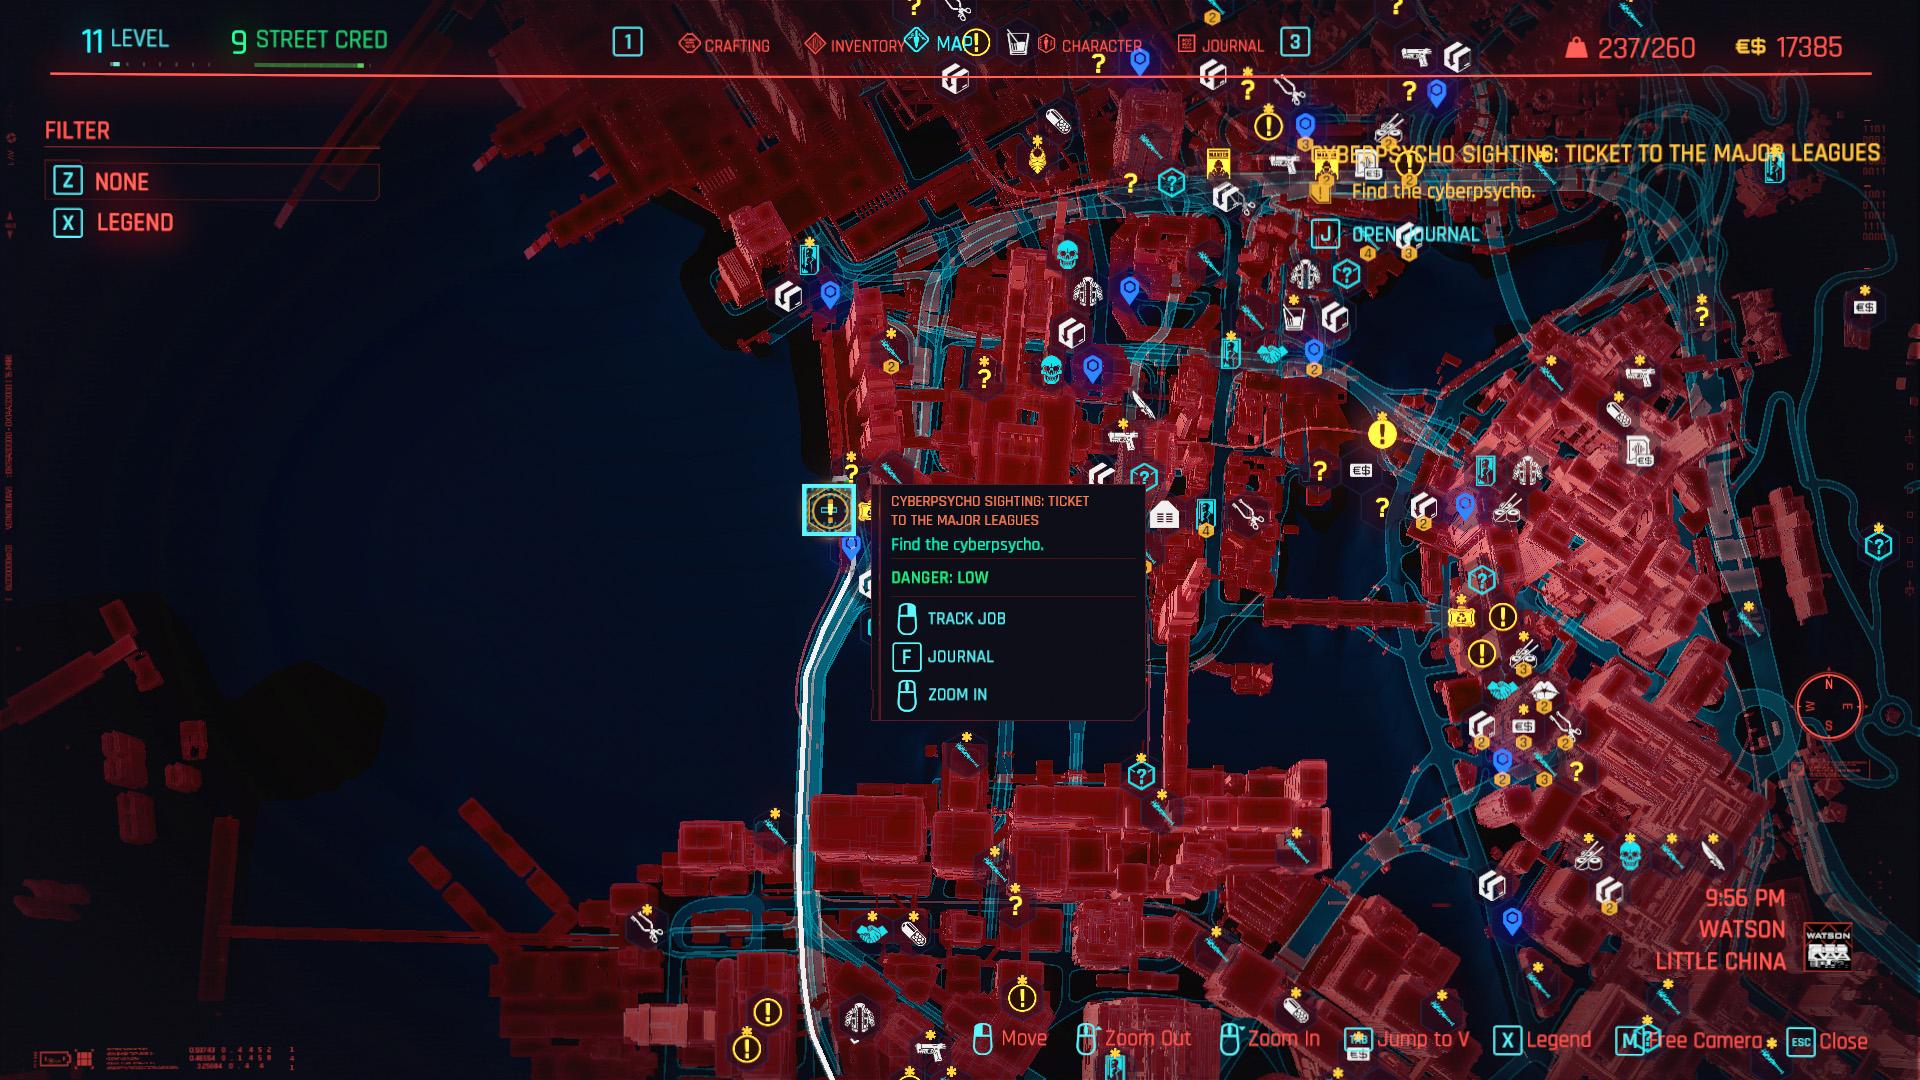 Cyberpunk 2077 Cyberpsycho Sightings locations